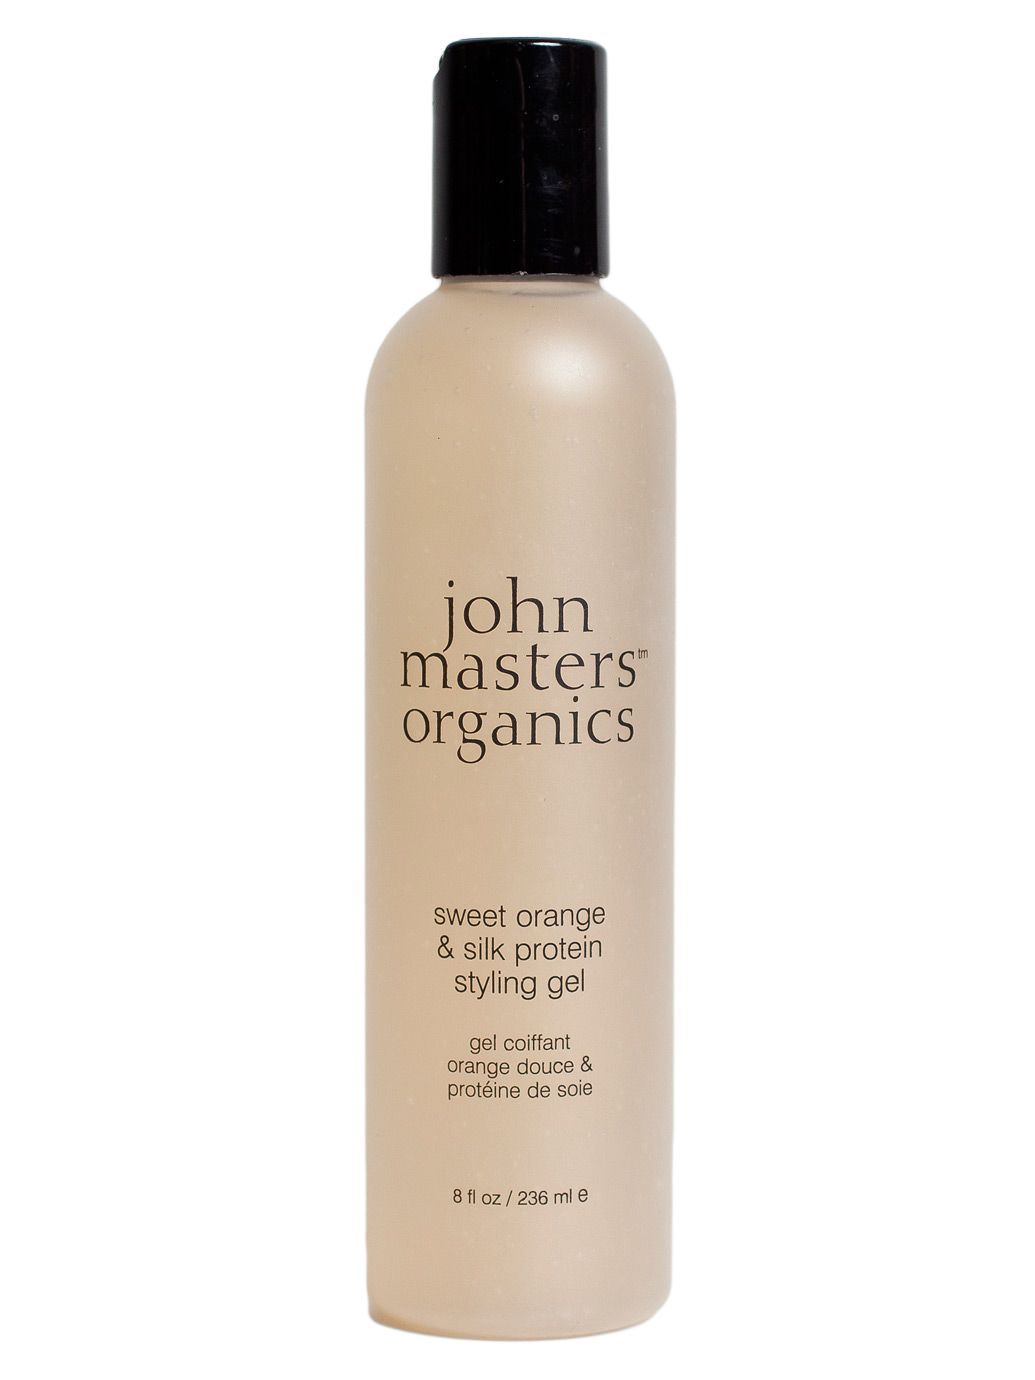 http://gr.strawberrynet.com/skincare/john-masters-organics/